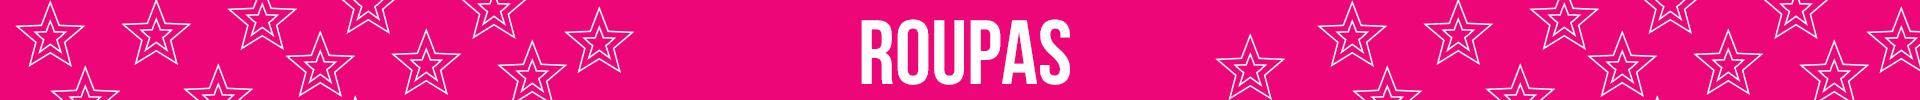 Banner Dep Roupas | 1920x100